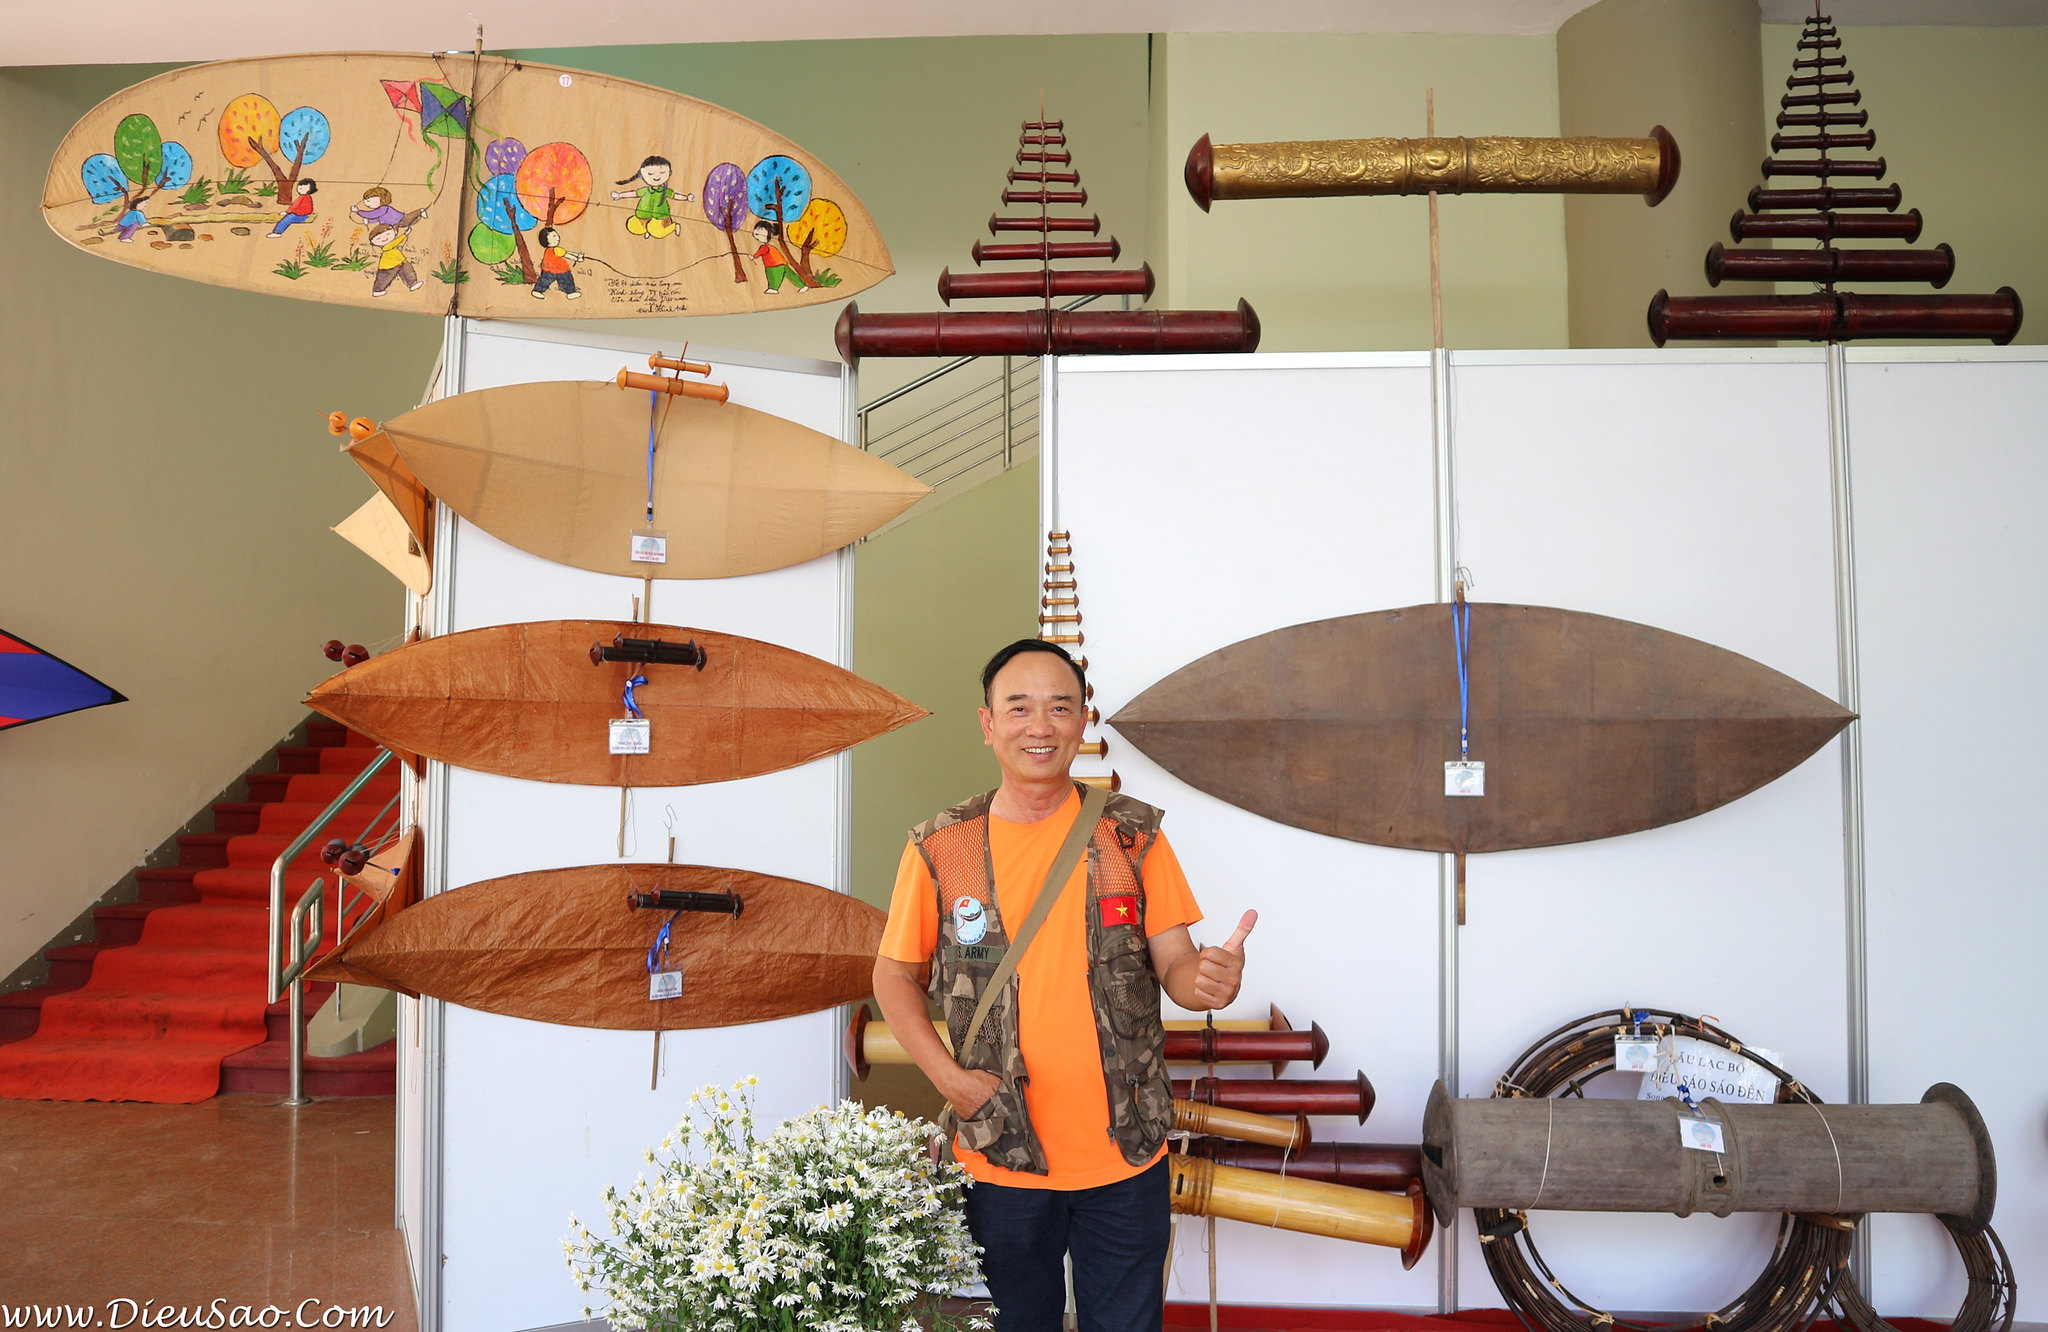 Ong Hoang Van Diep - Giam doc Trung tam Bao ton Van hoa Dieu Viet Nam